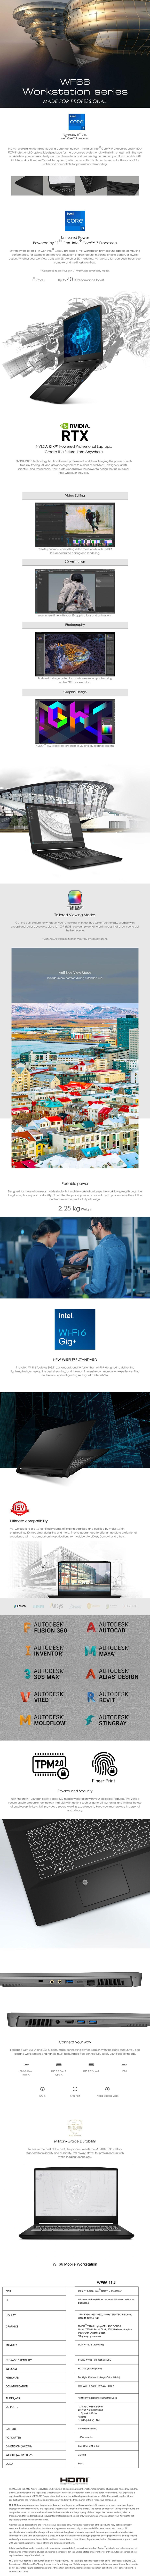 msi-wf66-11ui-156-mobile-workstation-i7-16gb-512gb-t1200-w10p-ac45416-1.jpg